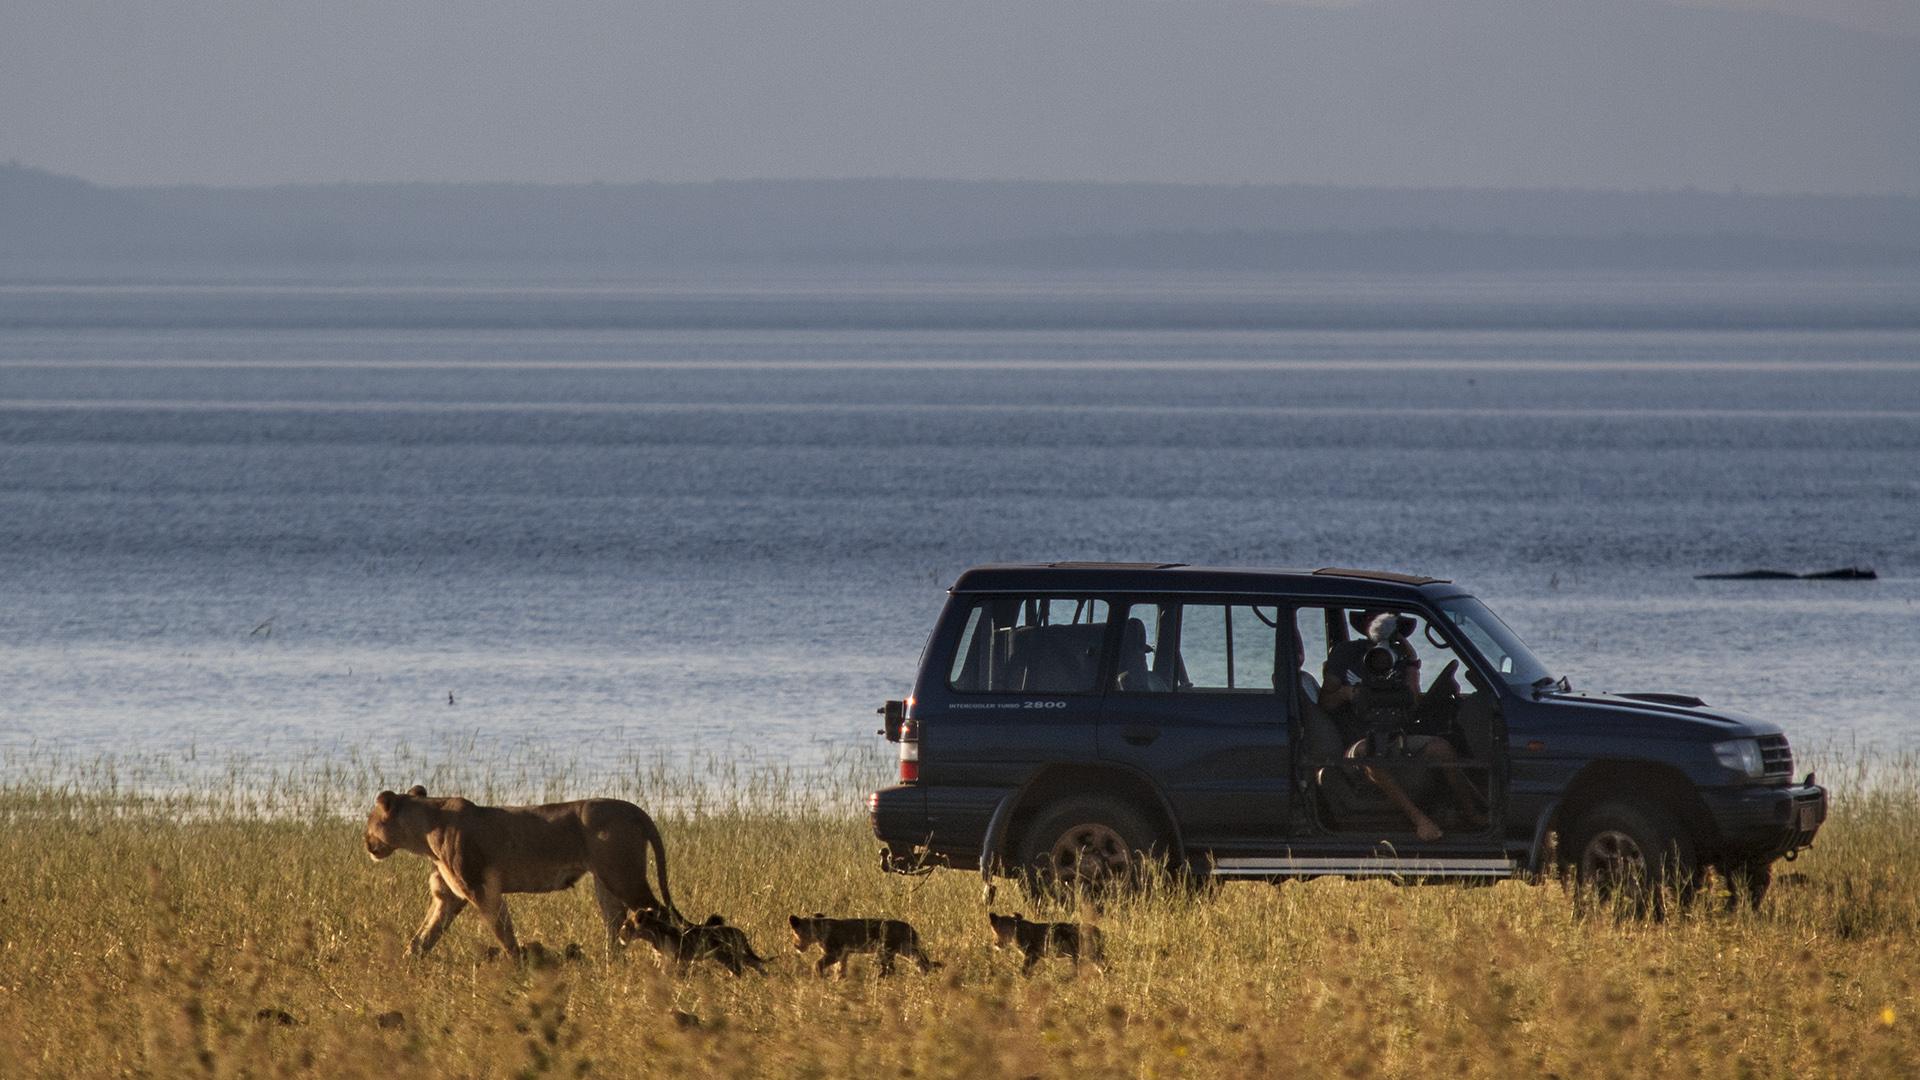 Filming vehicle along Kariba lakeshore - Photo by Rae Kokeš